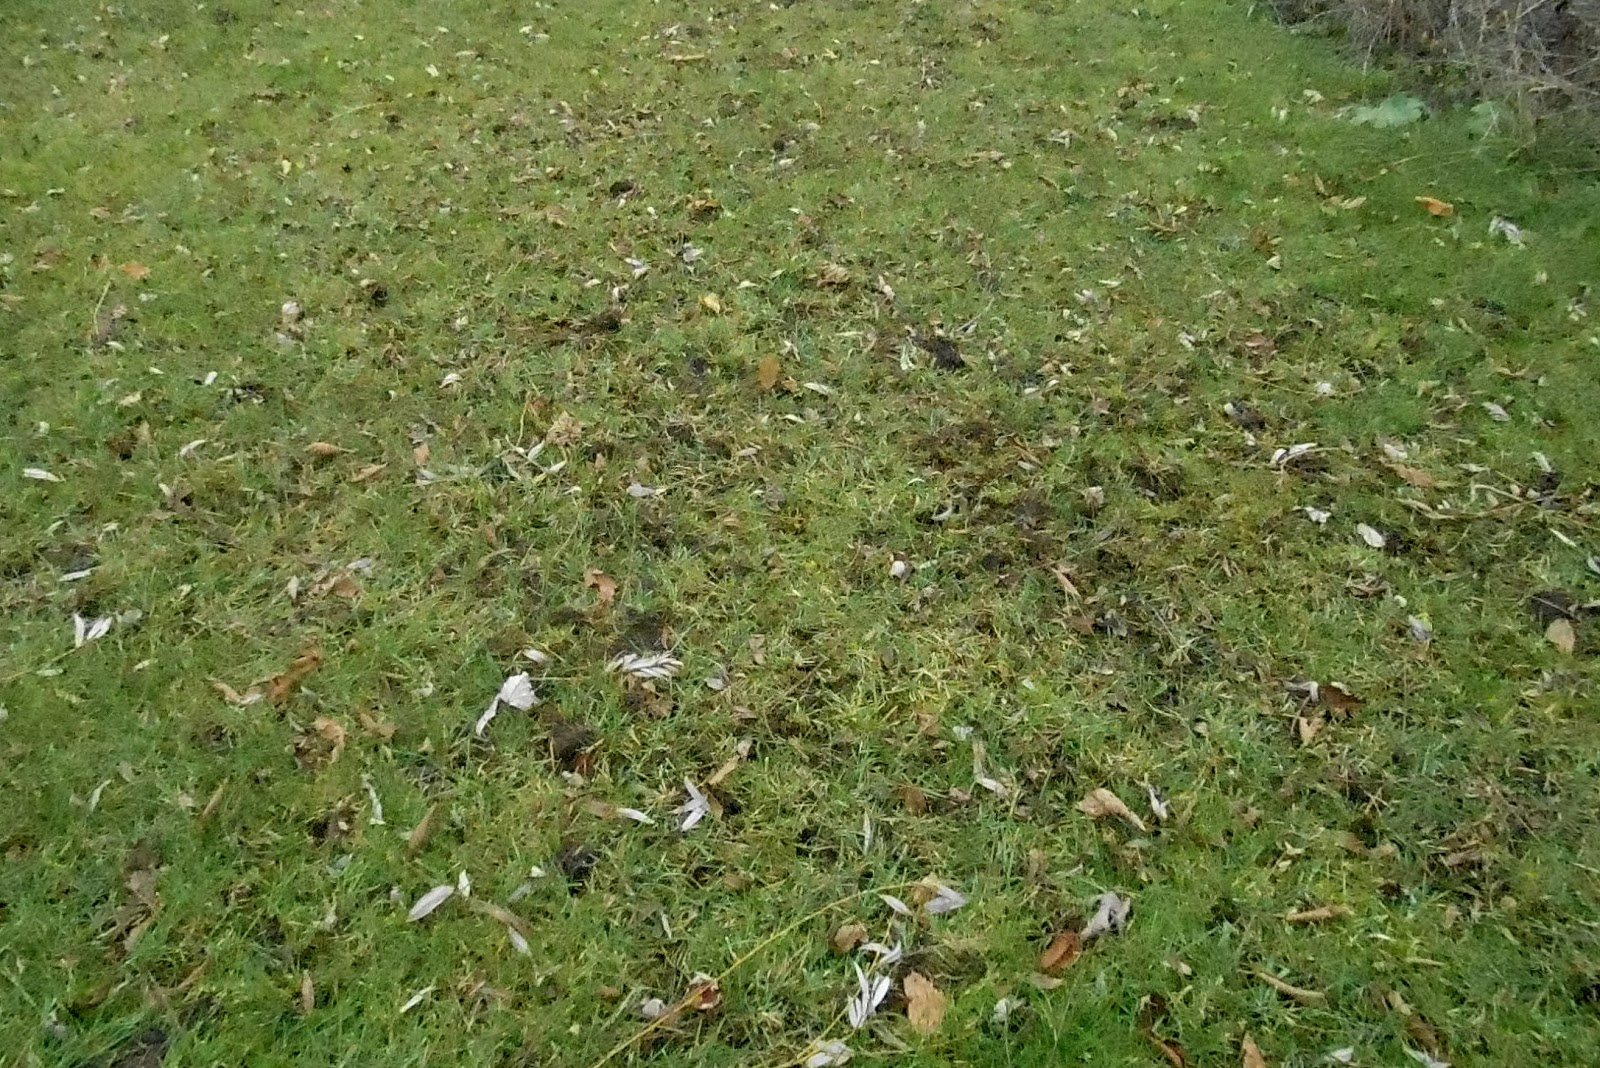 Backyard Beasts: Skunk diggings and droppings